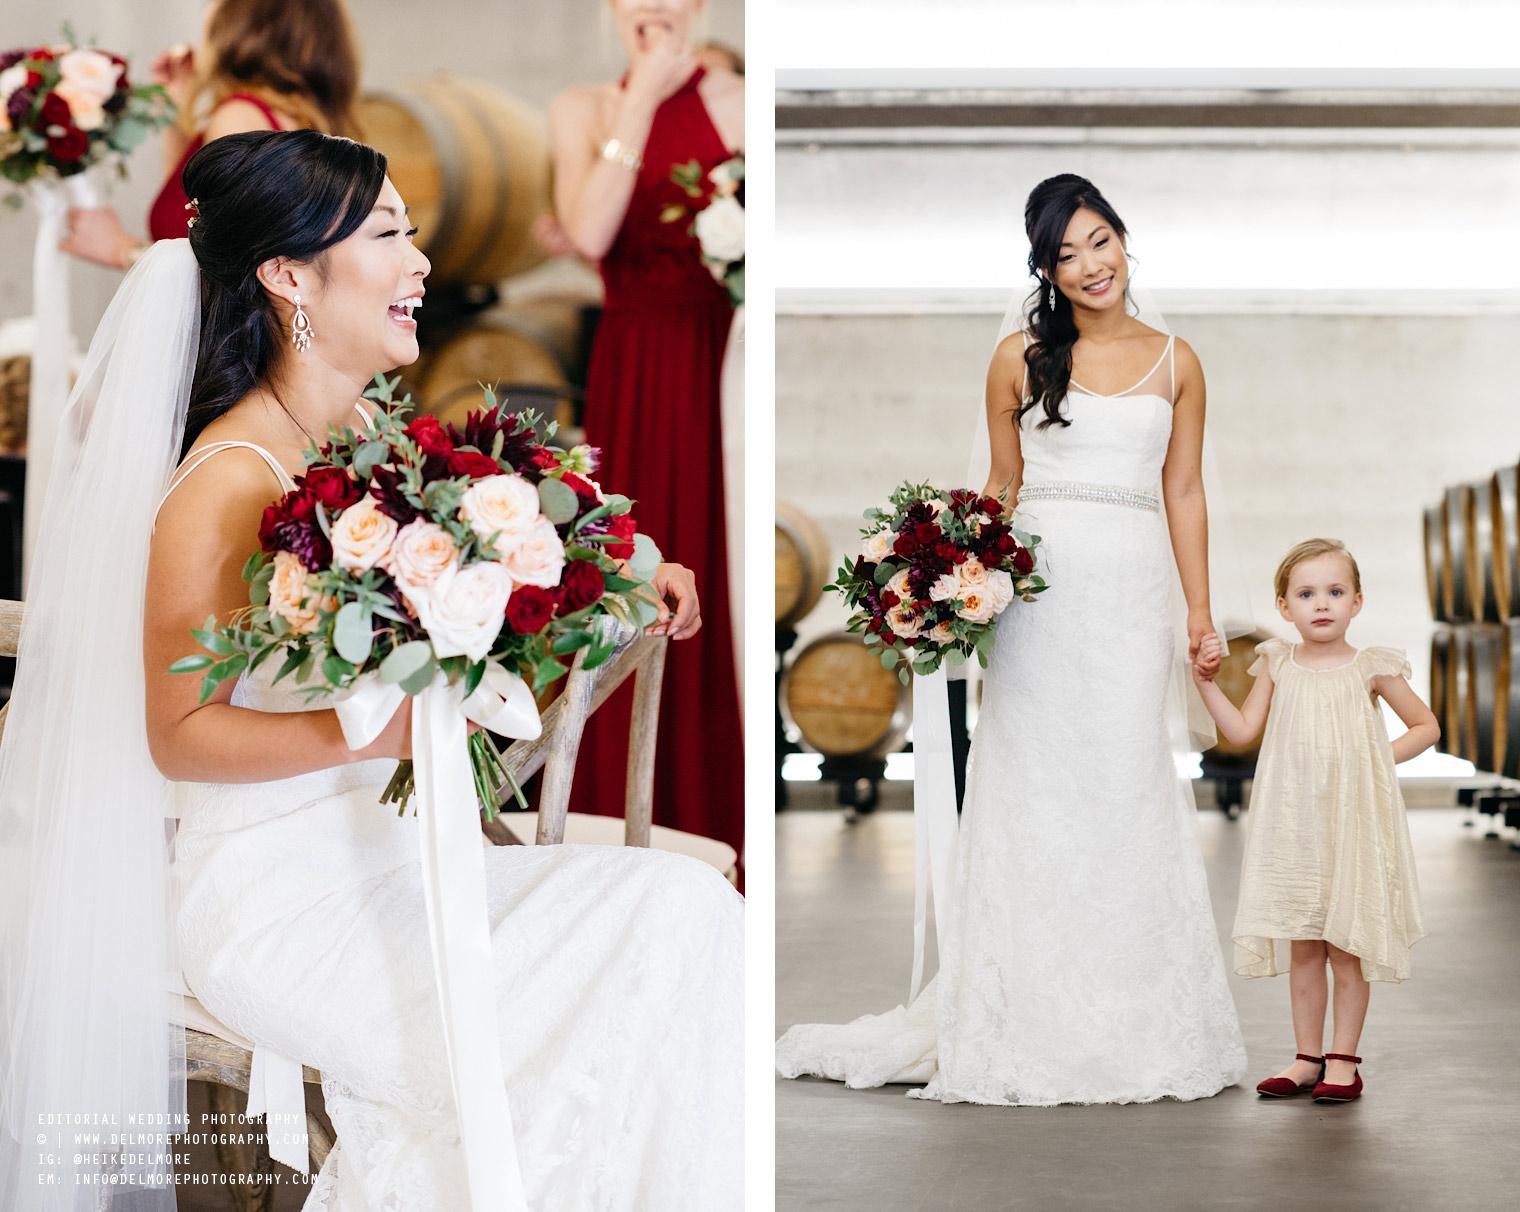 top-windsor-winery-wedding-photographer-029.jpg